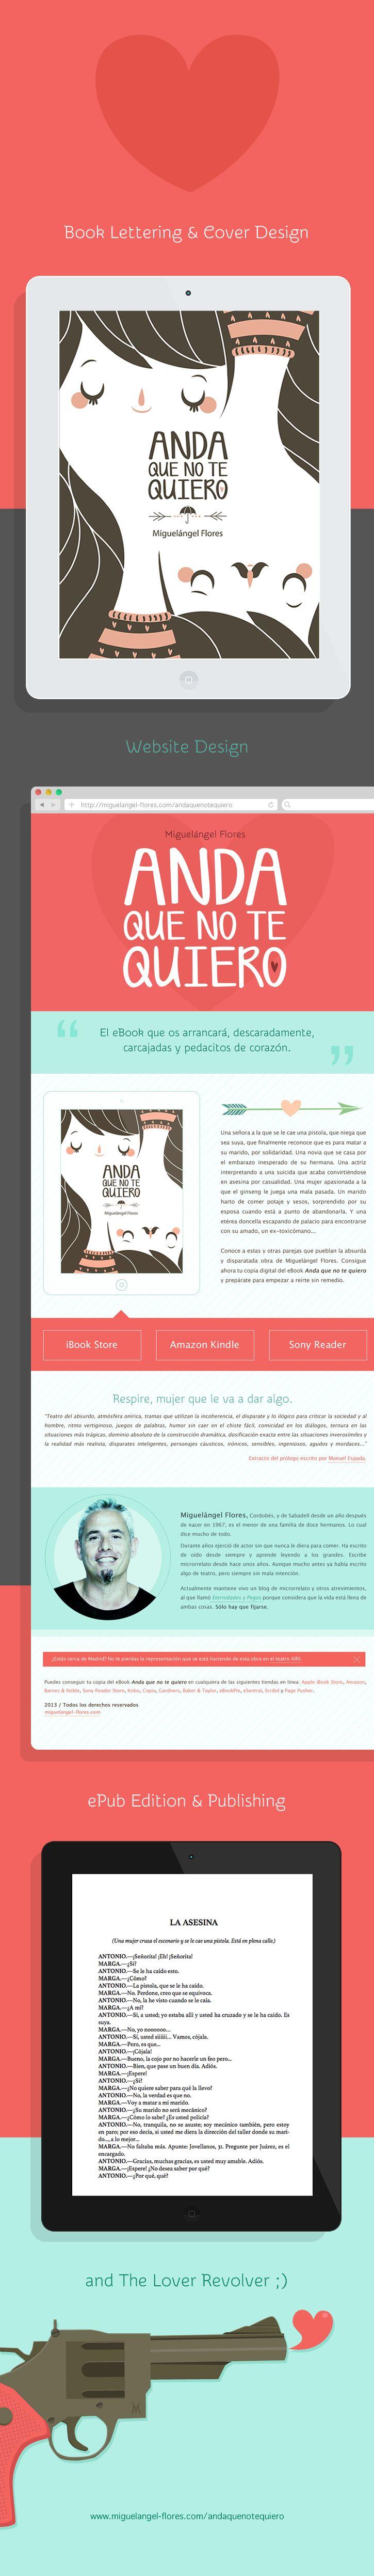 "Website, book cover and epub for the hilarious book ""Anda que no te quiero"" - http://miguelangel-flores.com/andaquenotequiero"